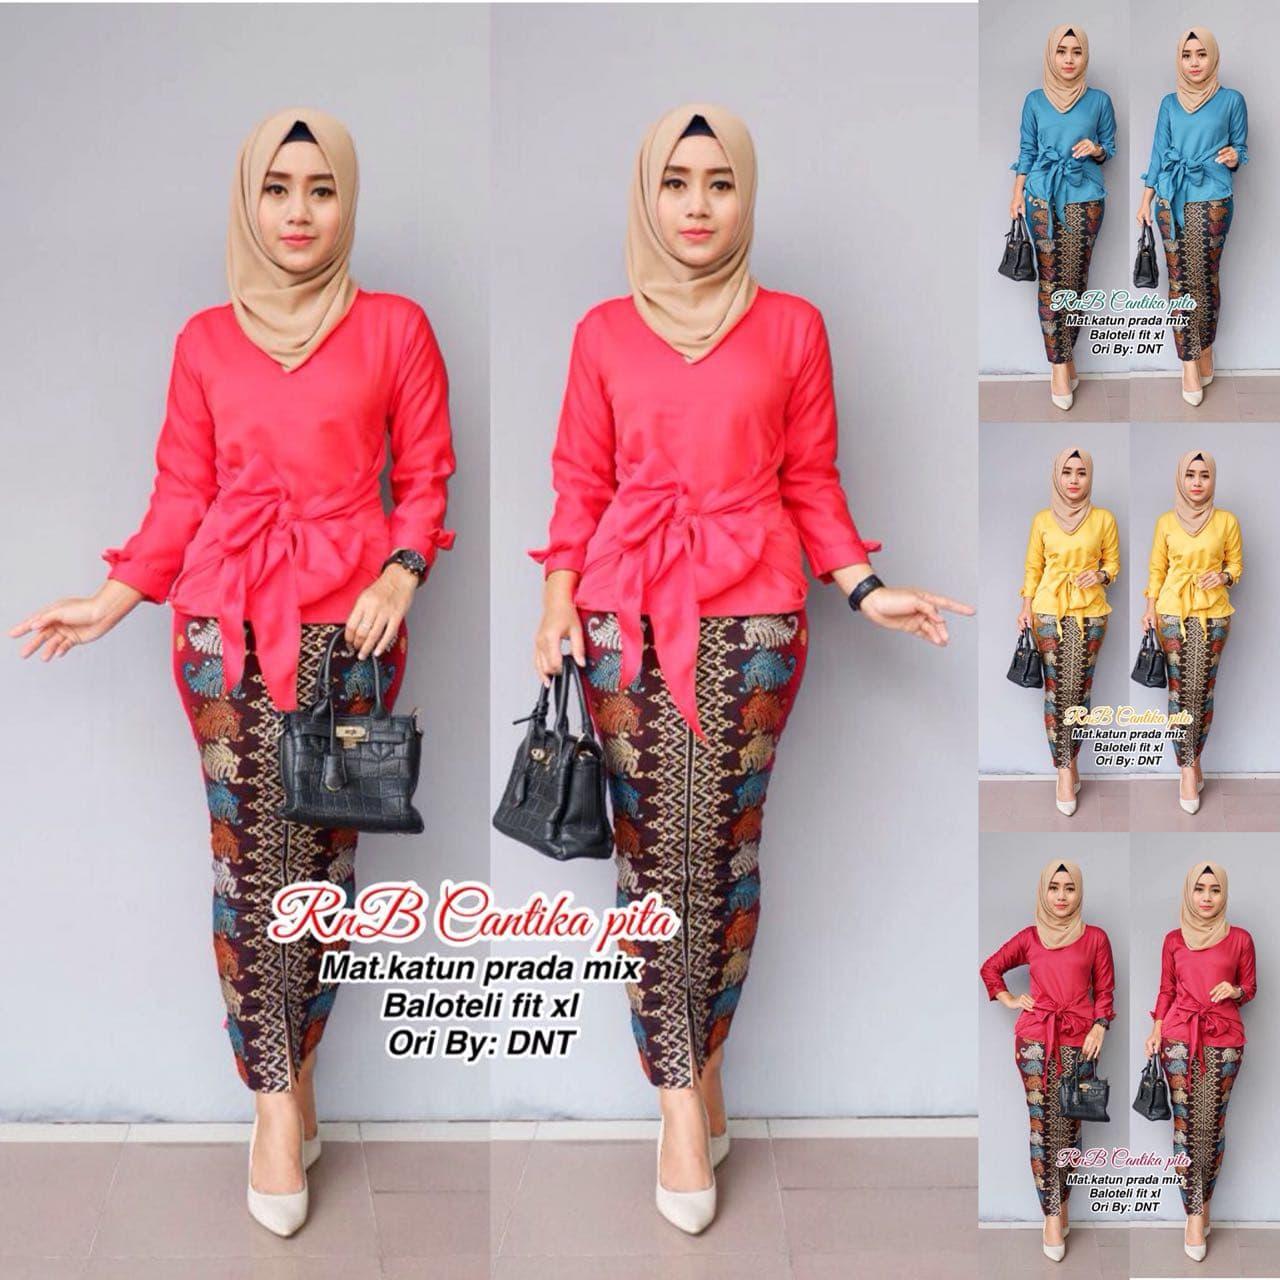 Rok dan Blus Cantika Pita, baju batik wanita kerja, batik murah modern